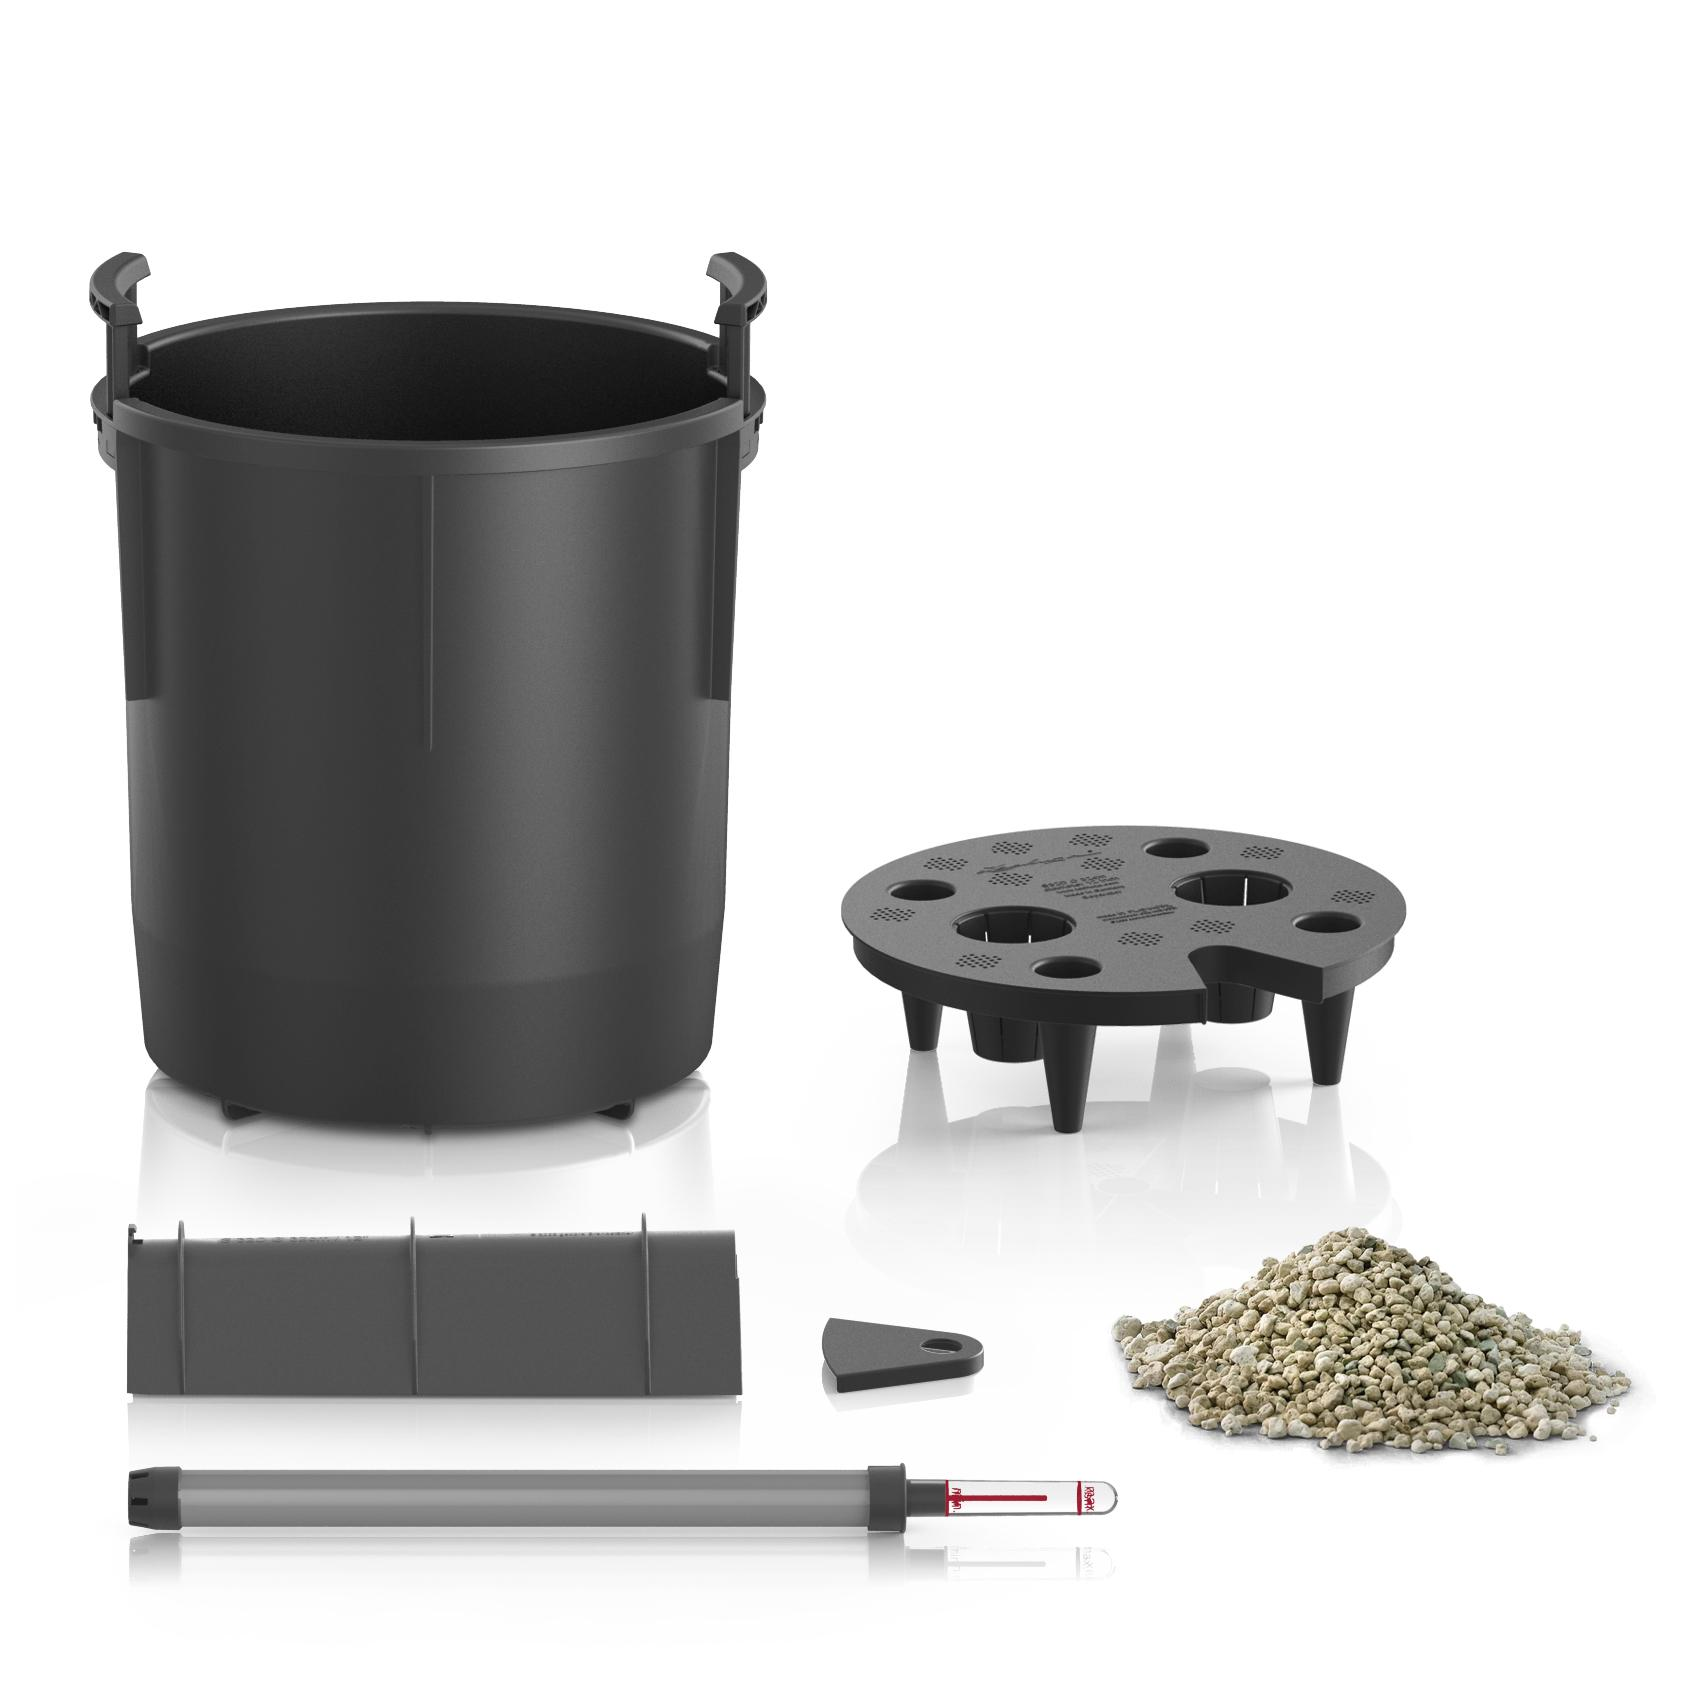 pflanzeinsatz-cilindro-puro_product_listingimage